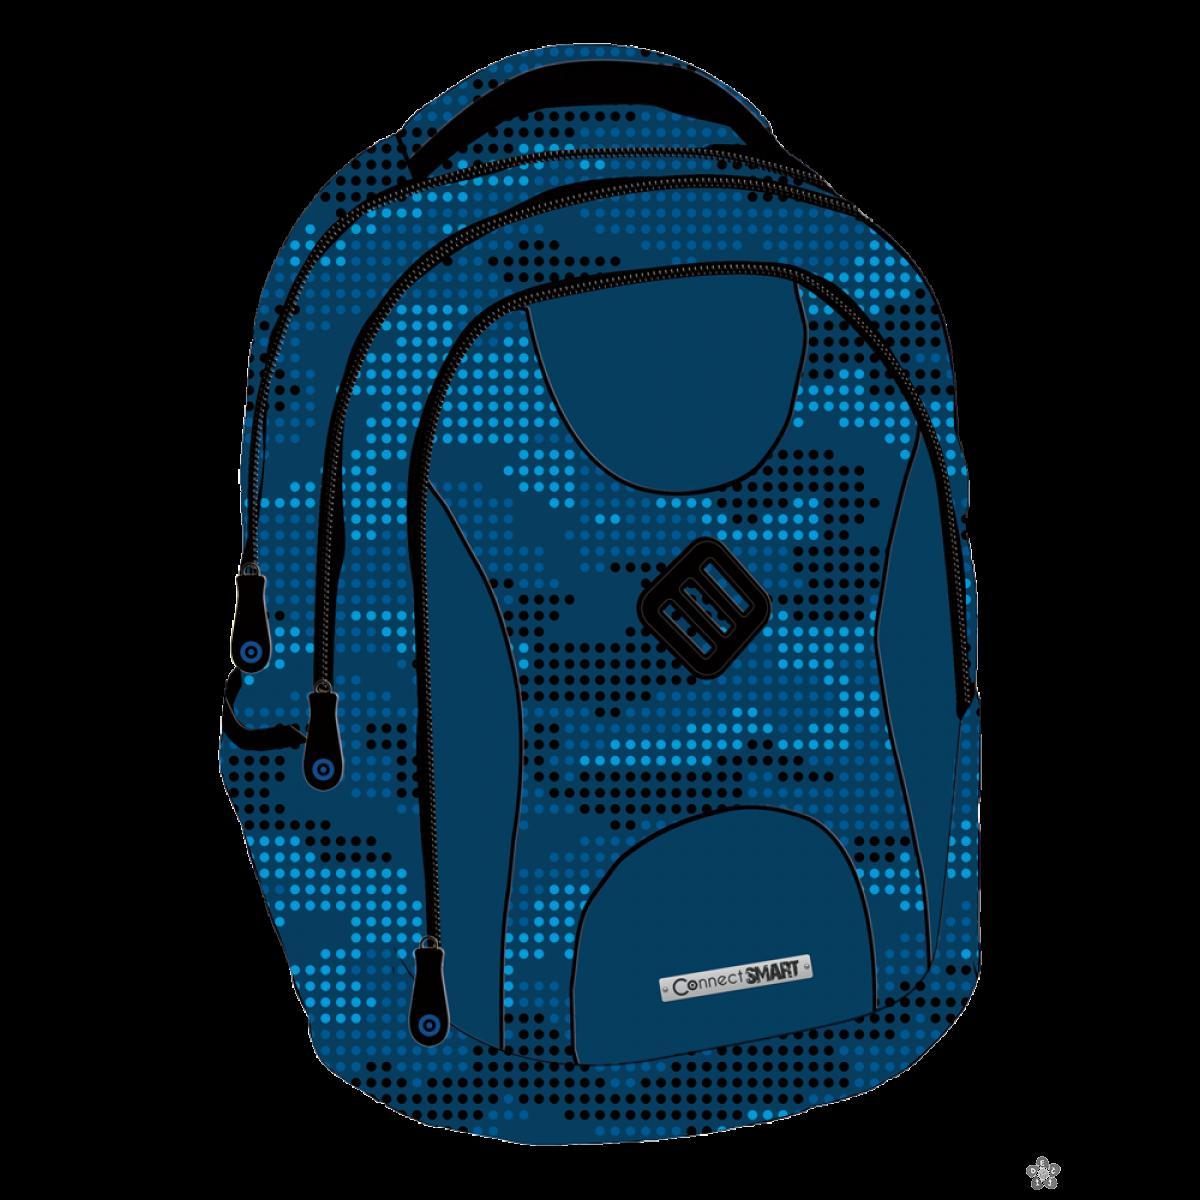 Ranac 2 u 1 Smart plavi 609891